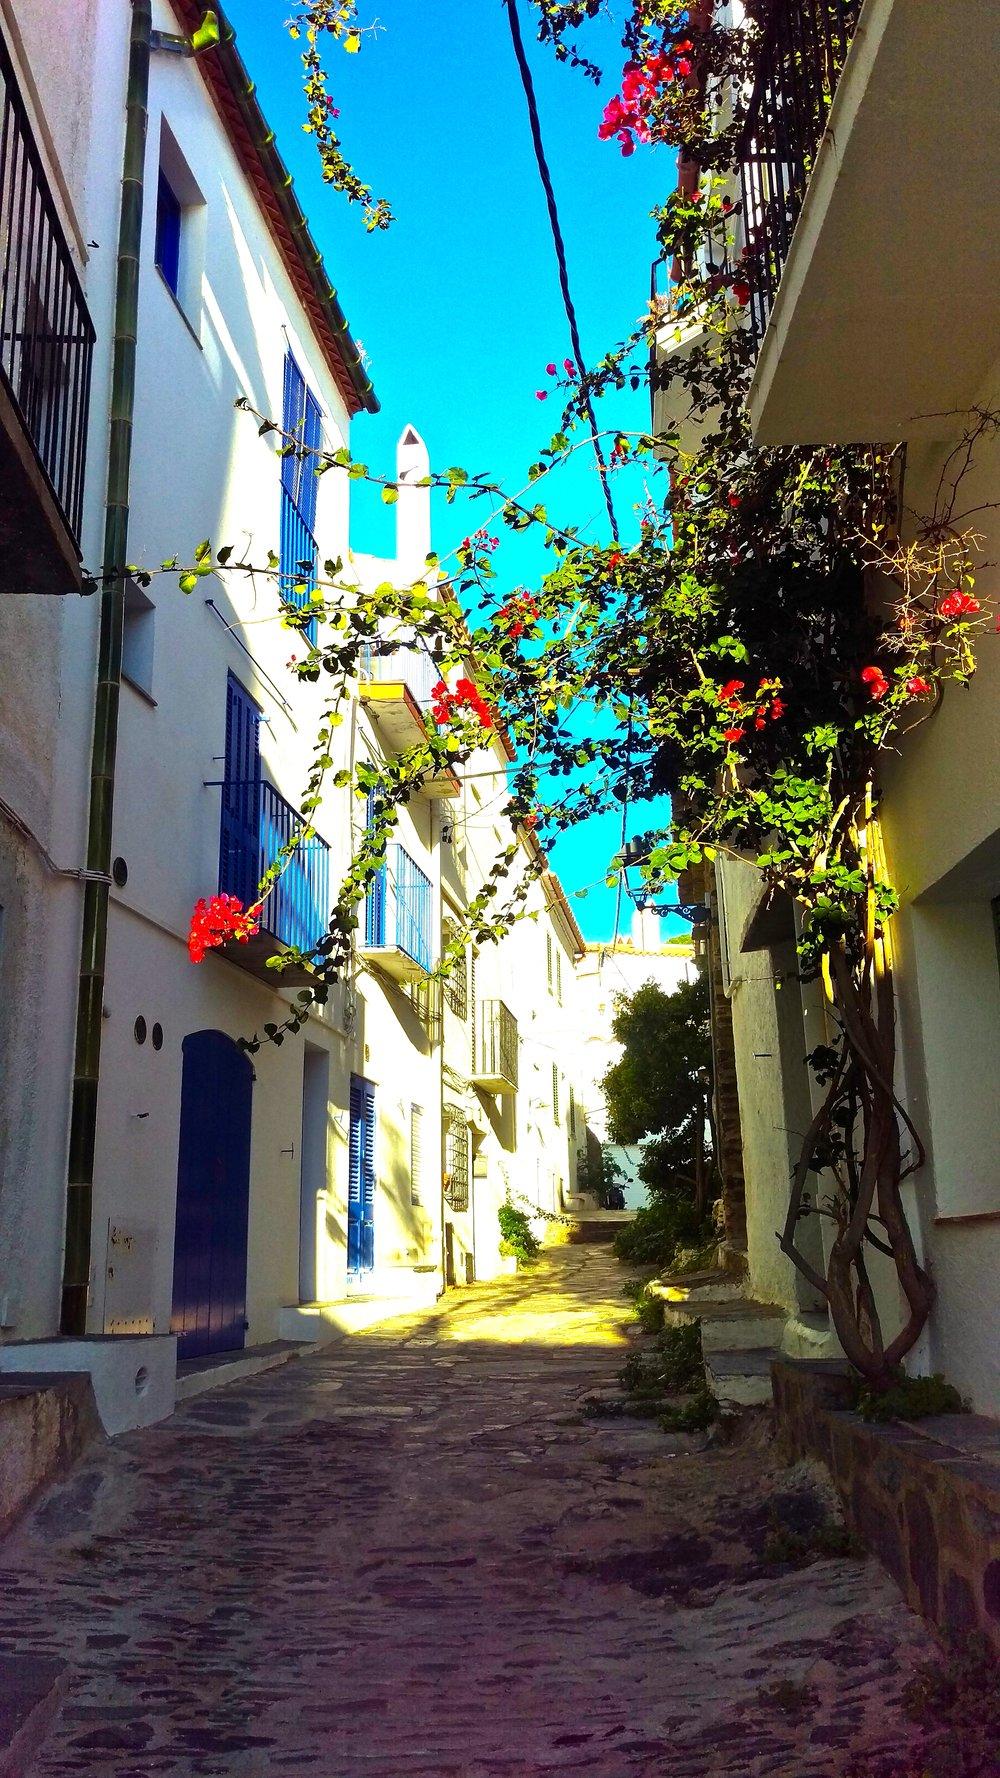 Bloomy streets of Cadaqués